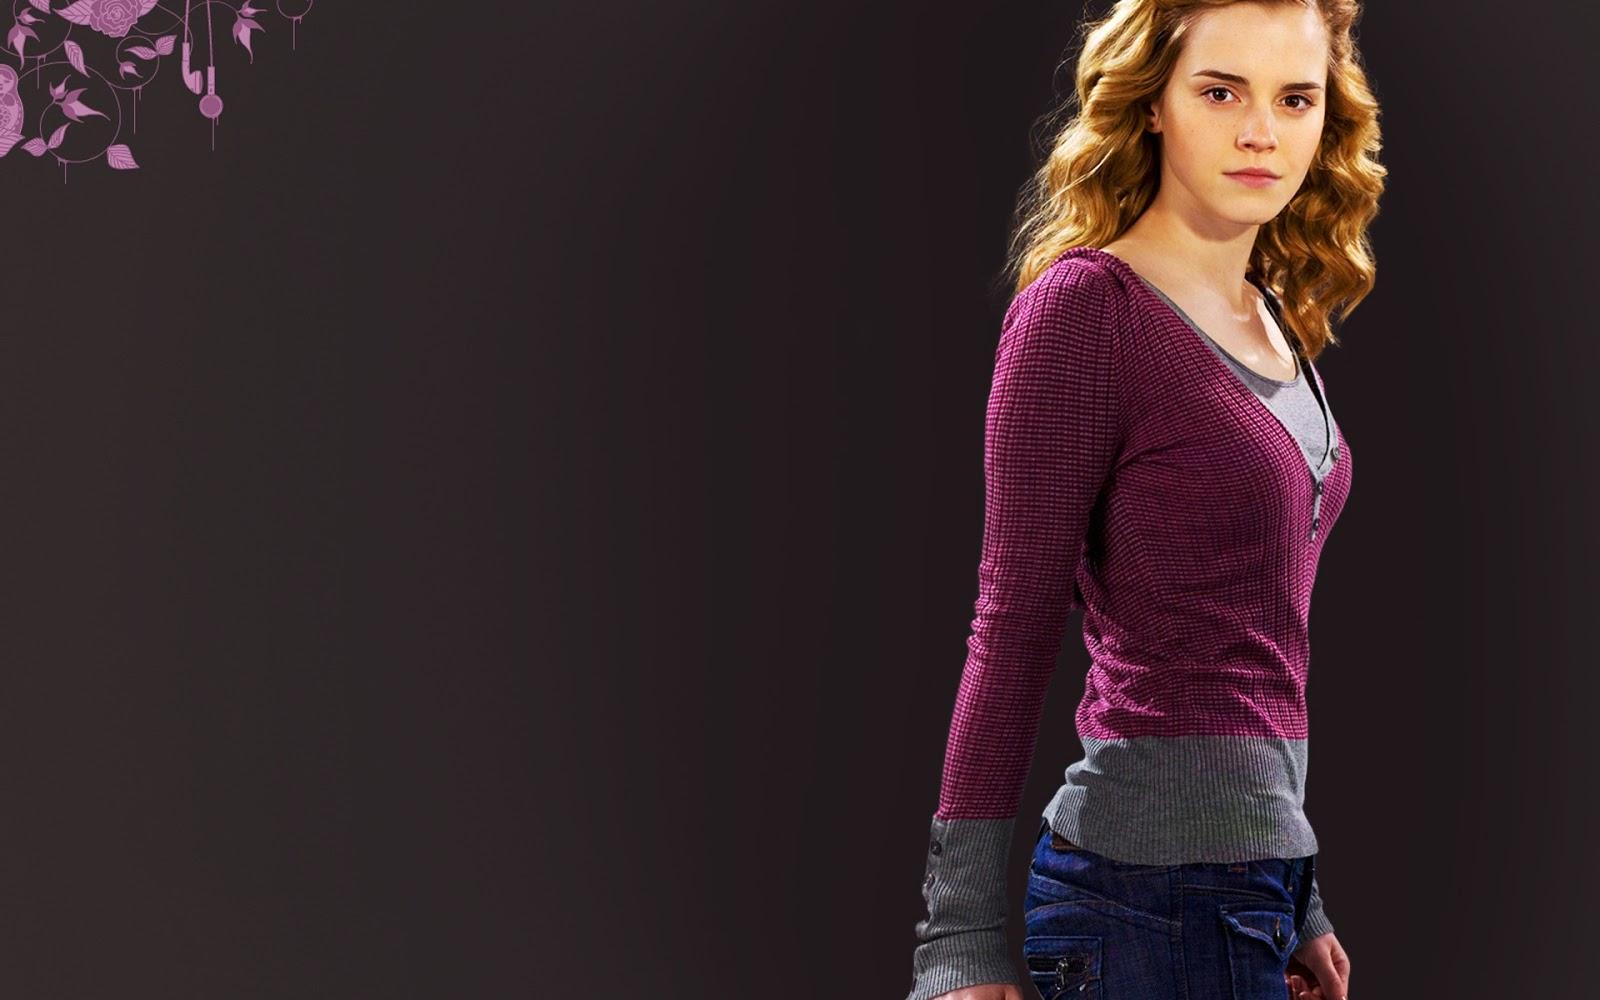 Emma Watson HD Wallpaper 1600x1000